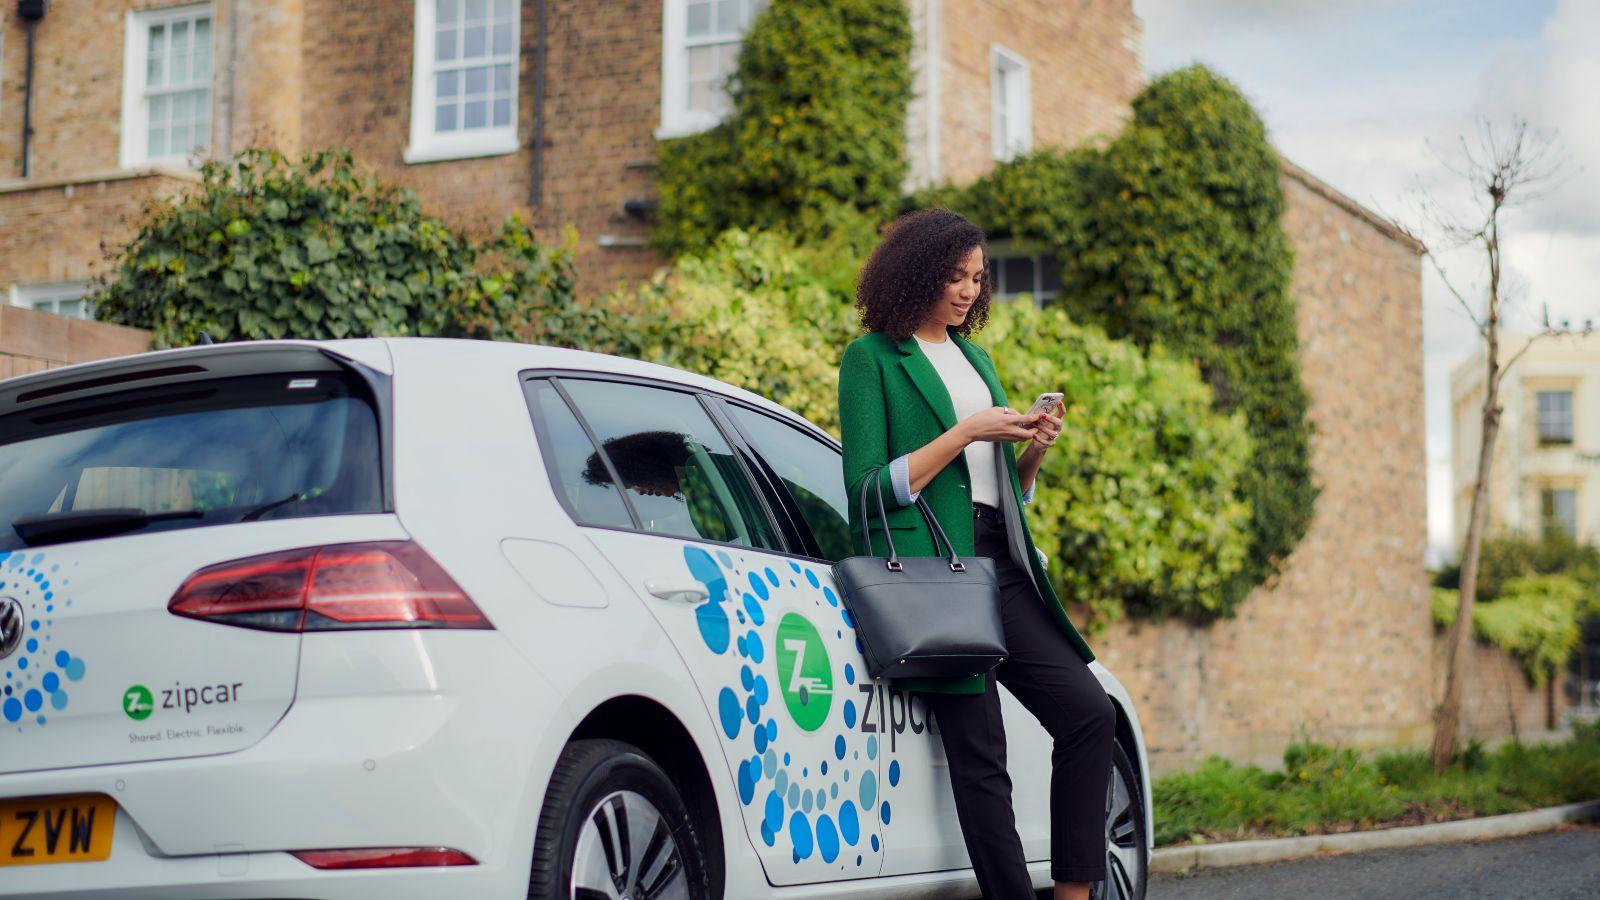 Woman renting a Zipcar electric car